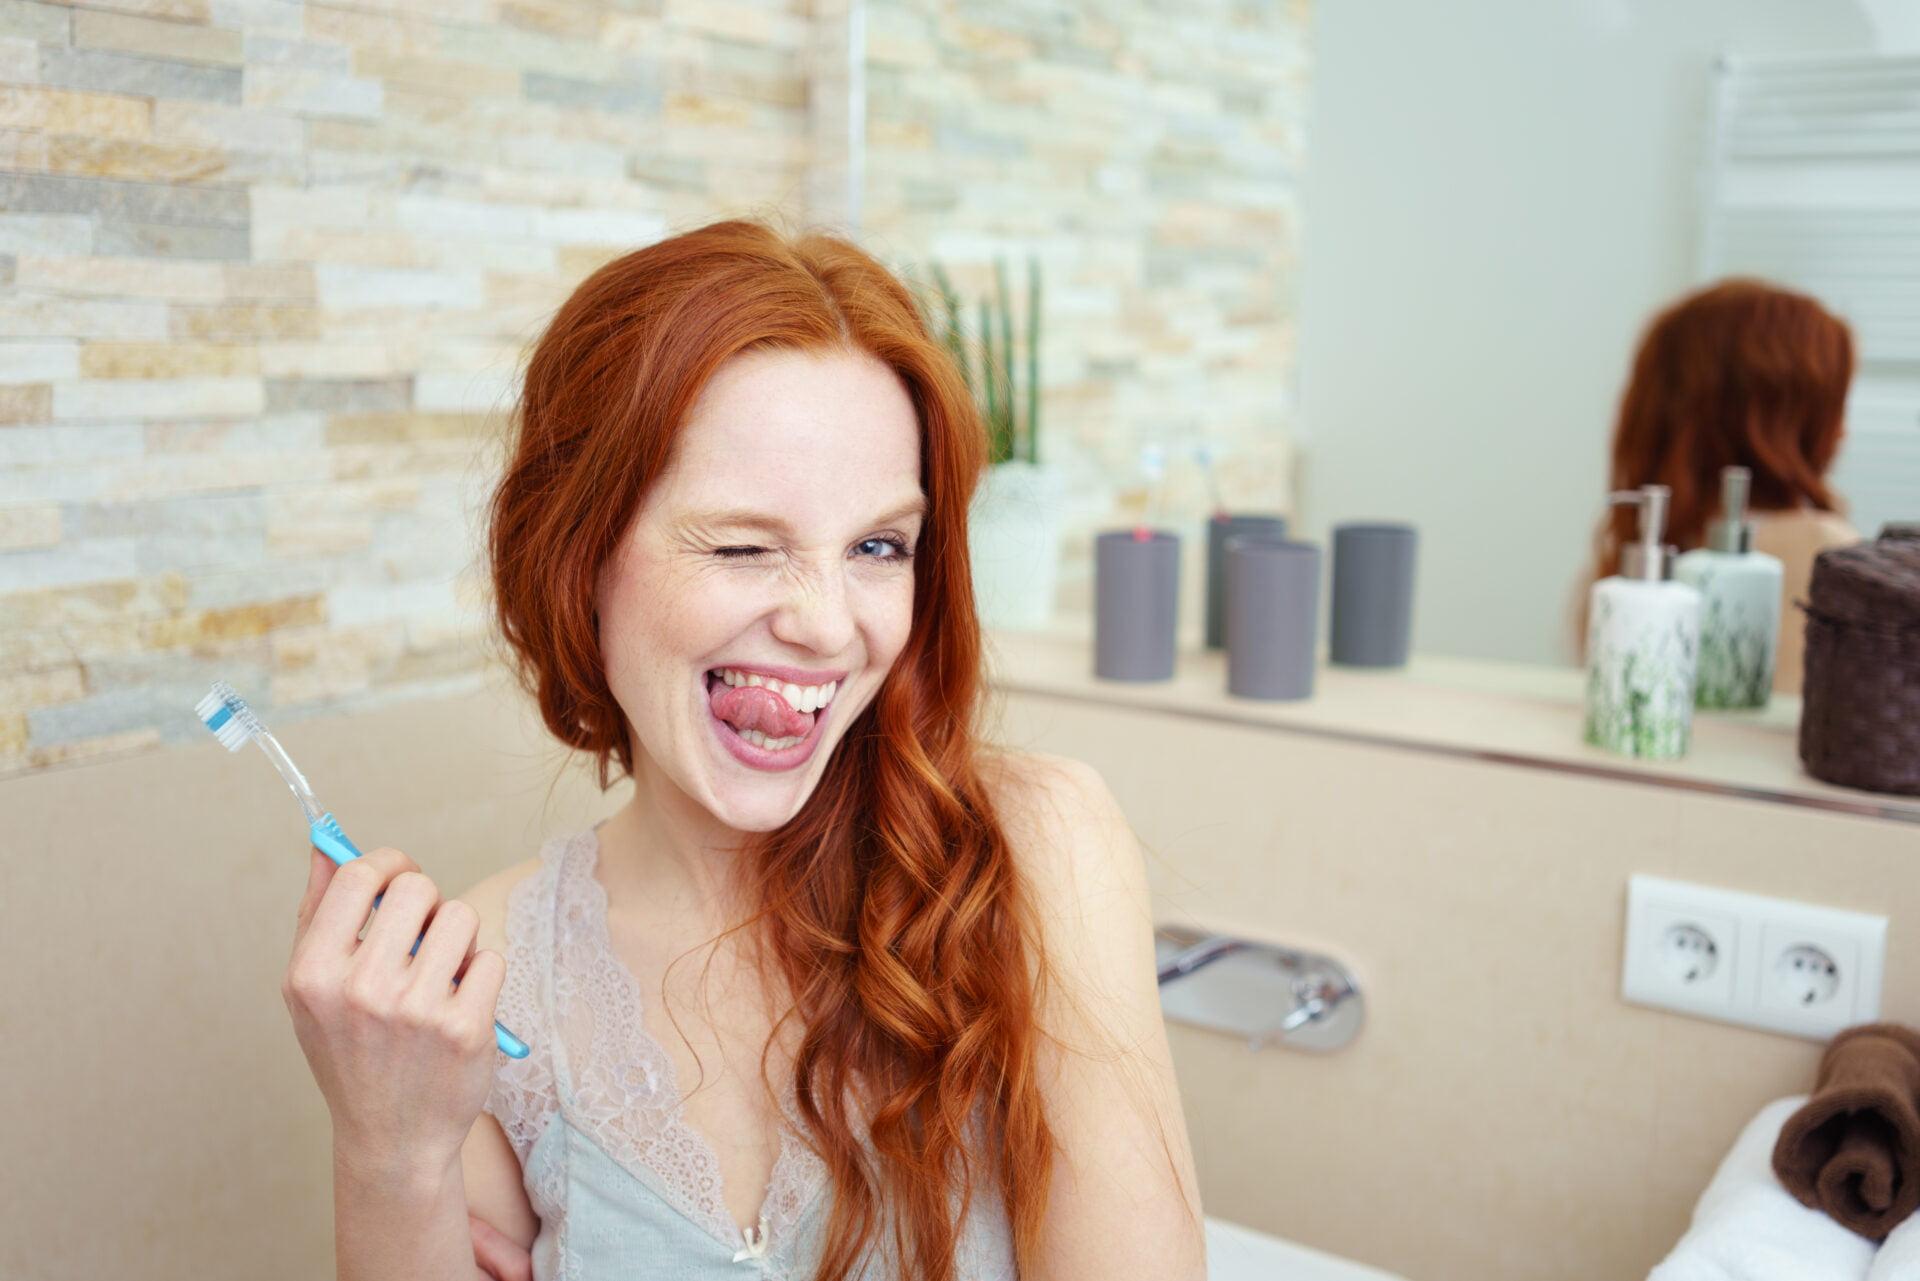 Playful redhead brushing her teeth